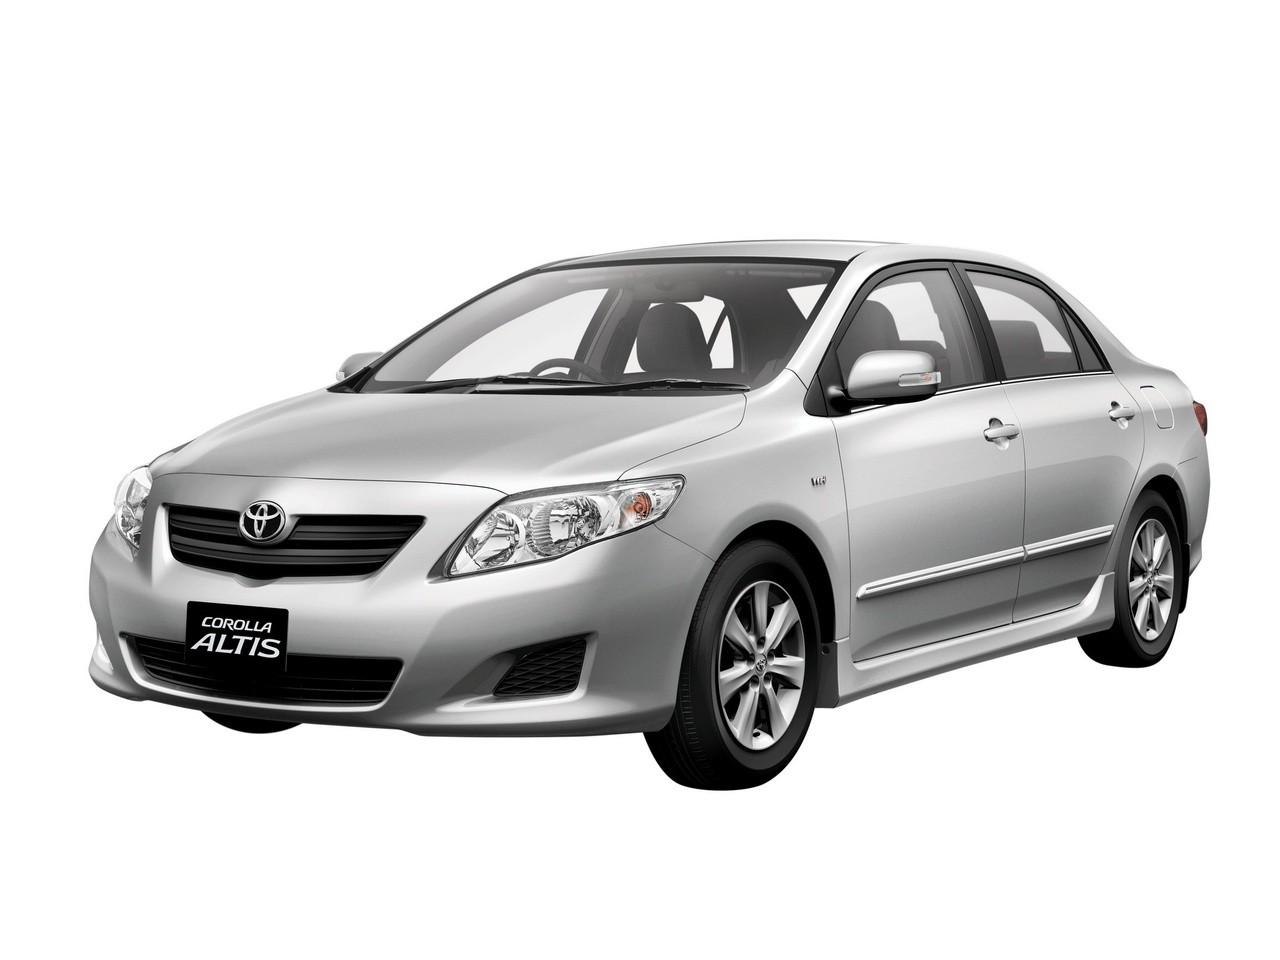 Toyota. Замена подвесного подшипника